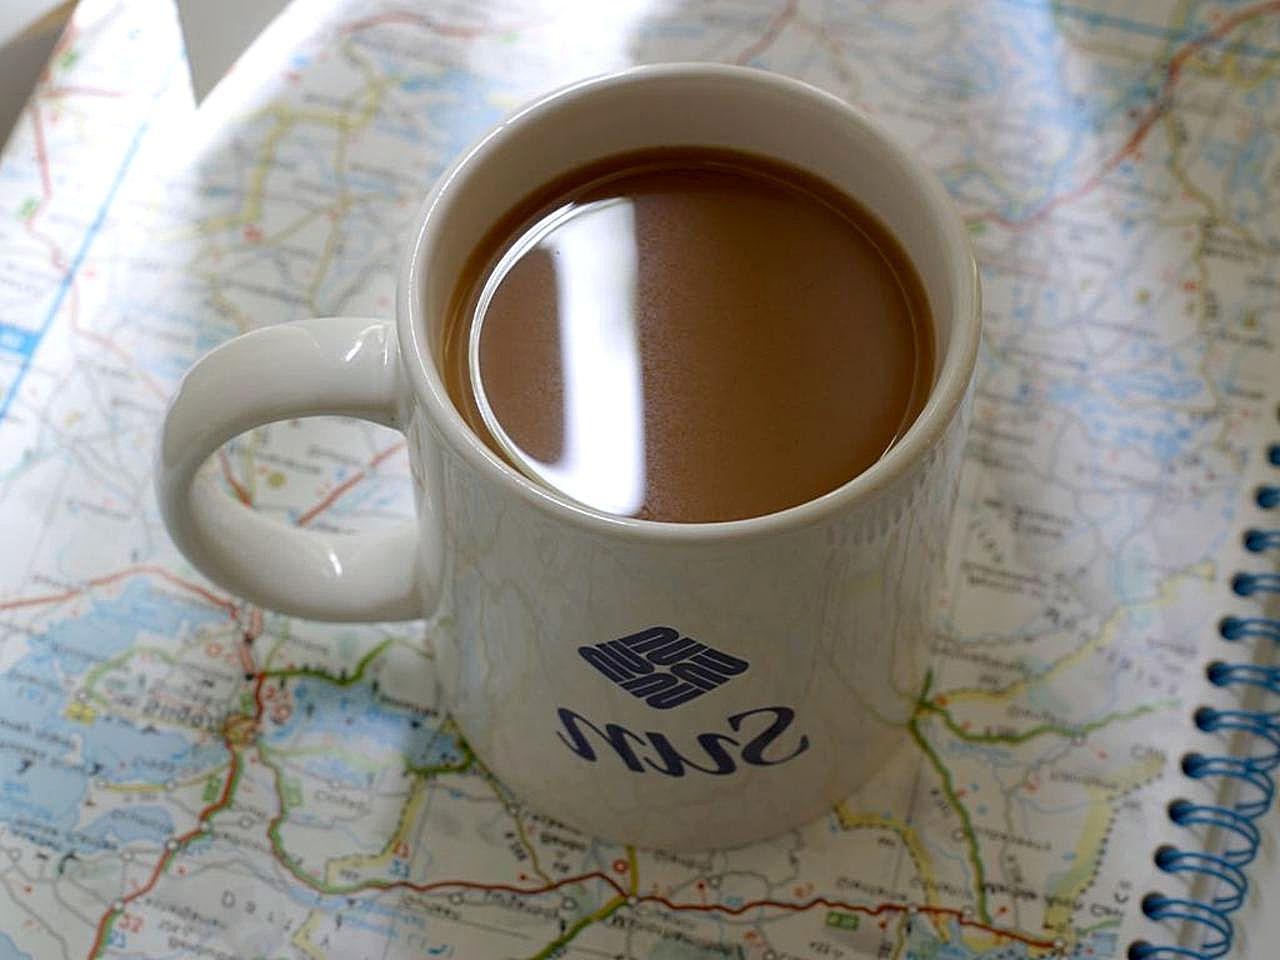 Foto gratis caff tazze bicchieri for Bicchieri caffe